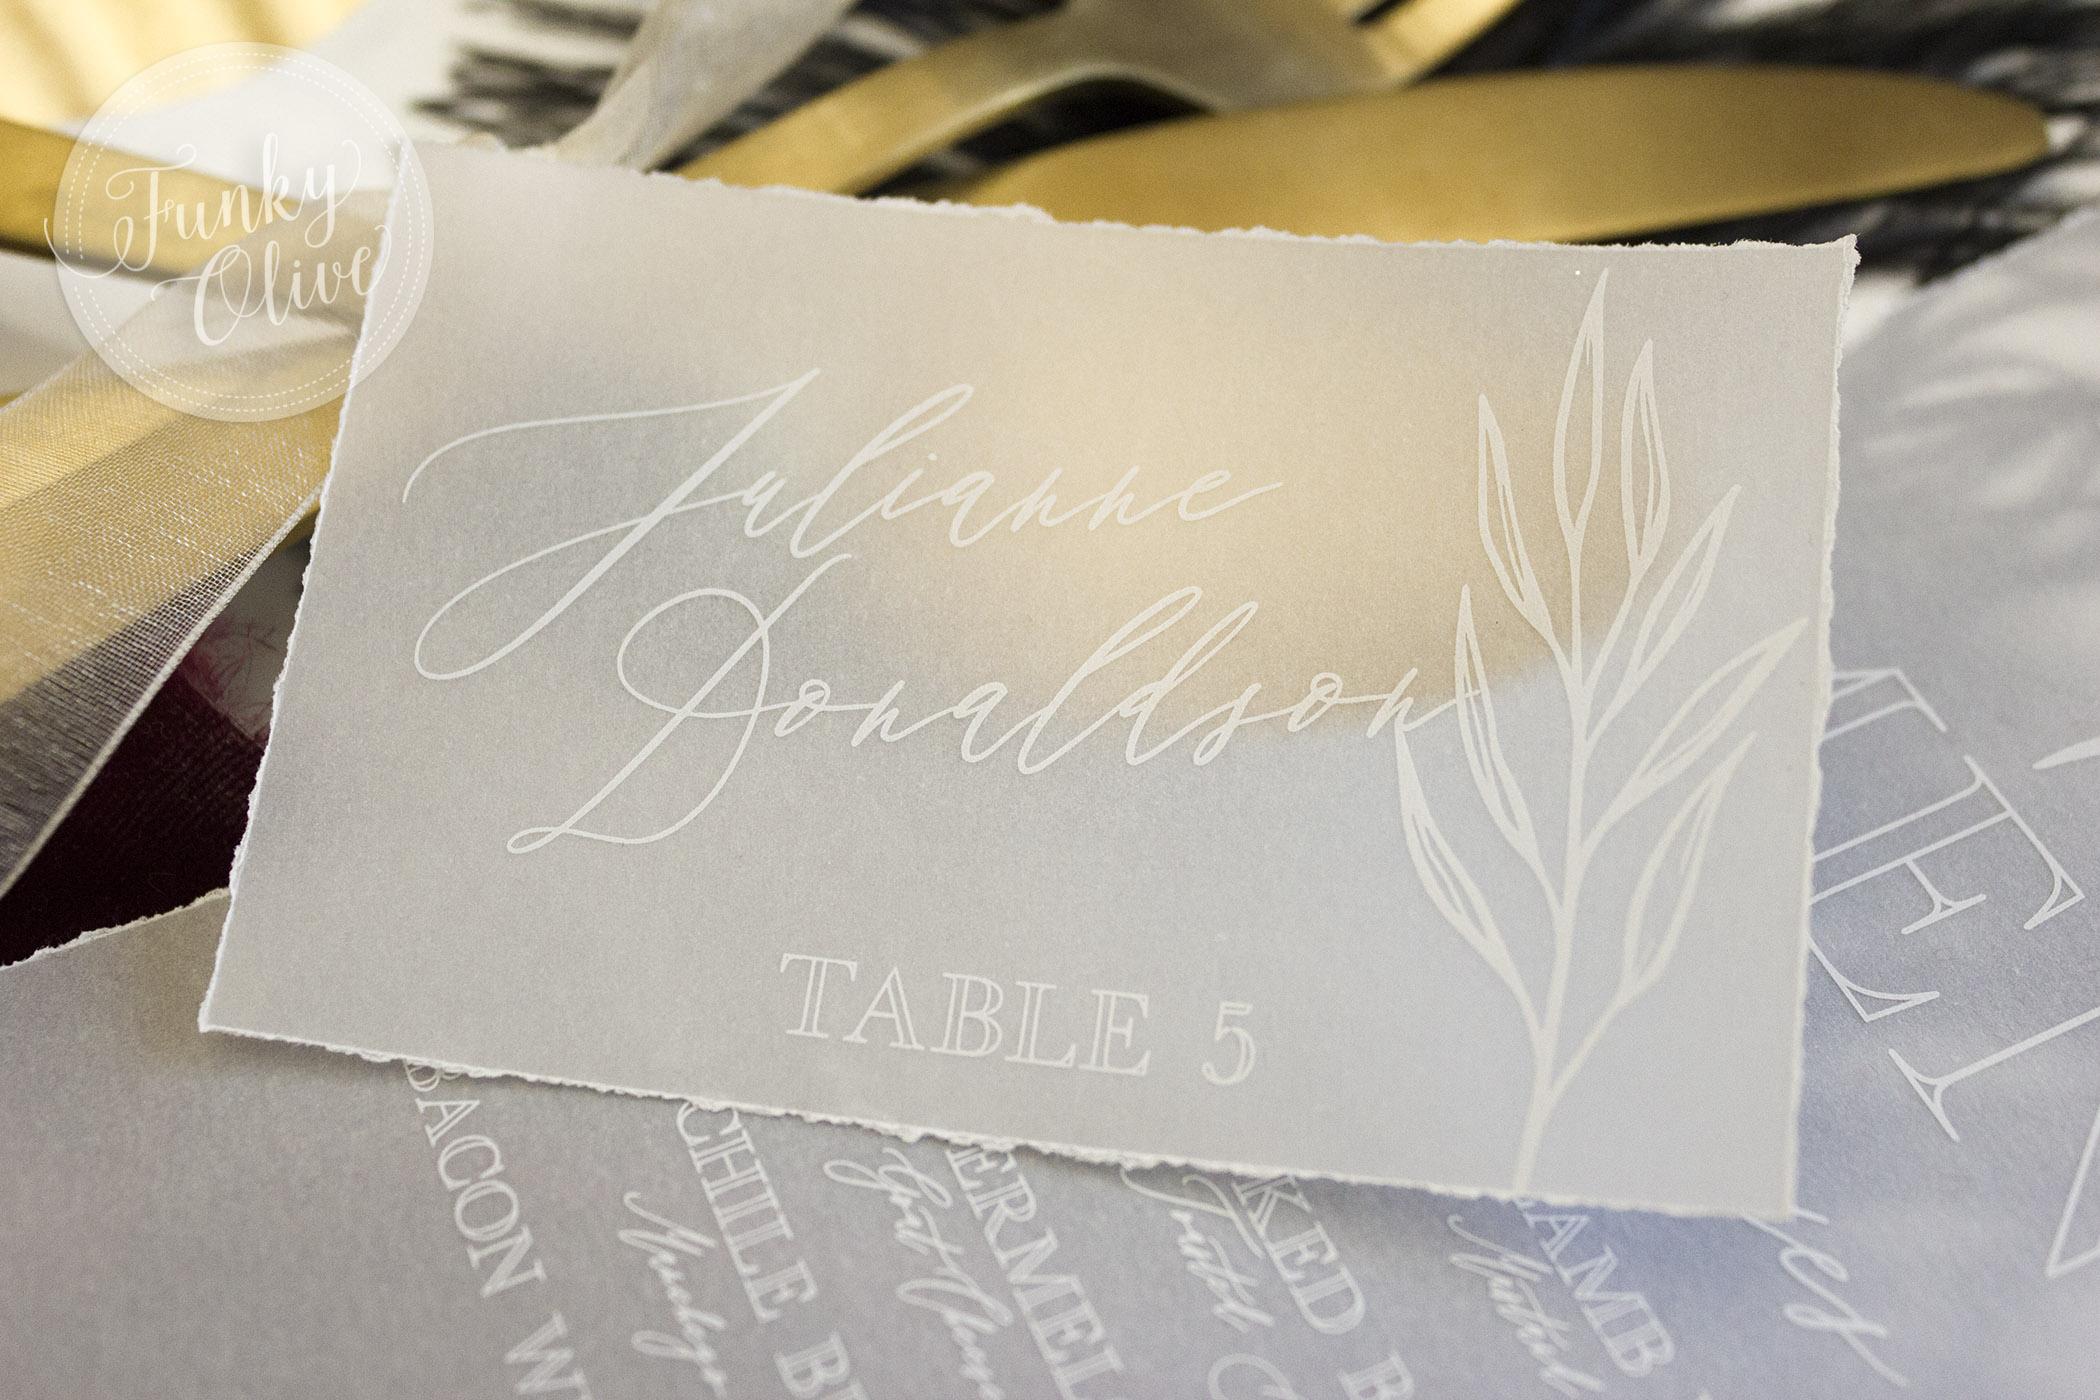 WHITE INK VELLUM PLACE CARD 3.jpg